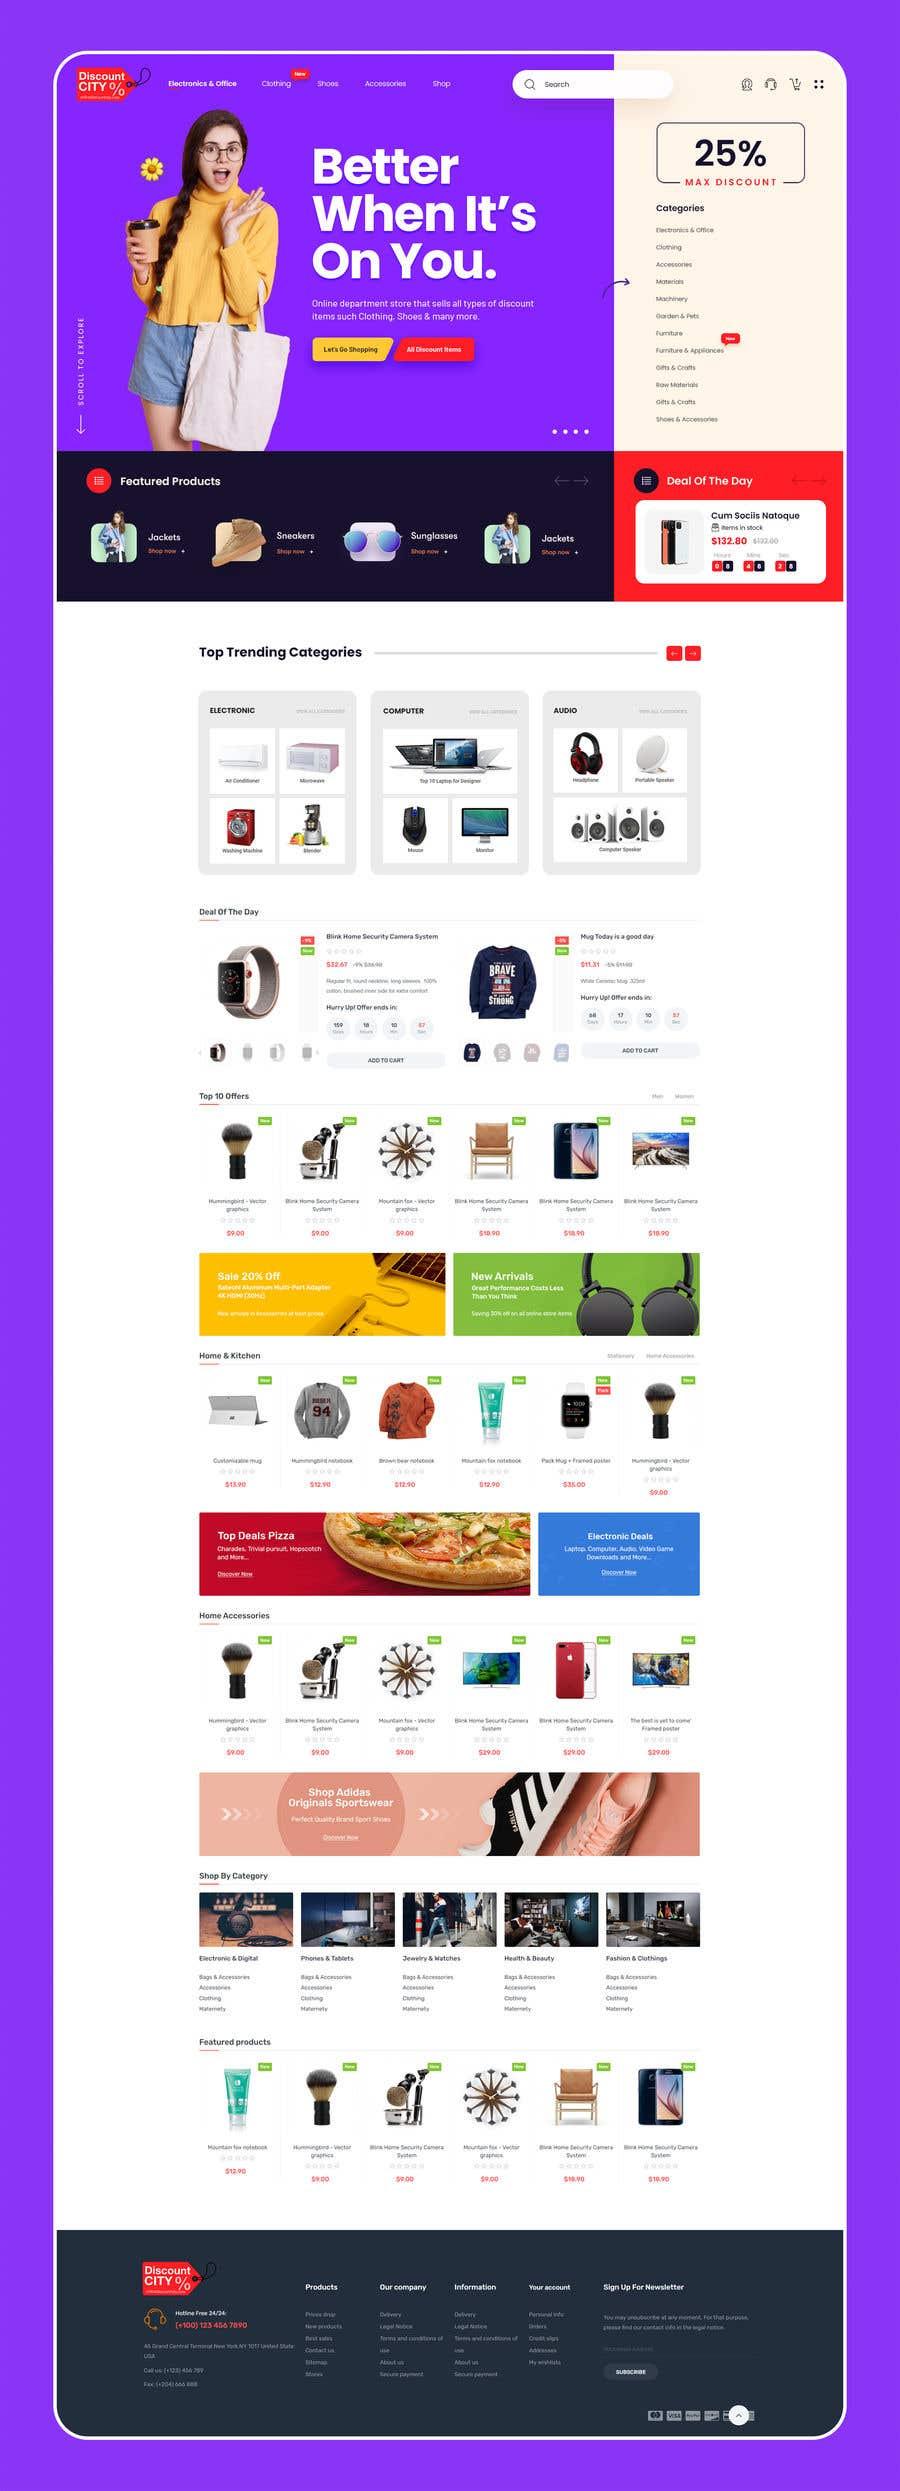 Penyertaan Peraduan #                                        58                                      untuk                                         Create a website (online store e-Commerce) ***NO WORDPRESS ALLOWED***